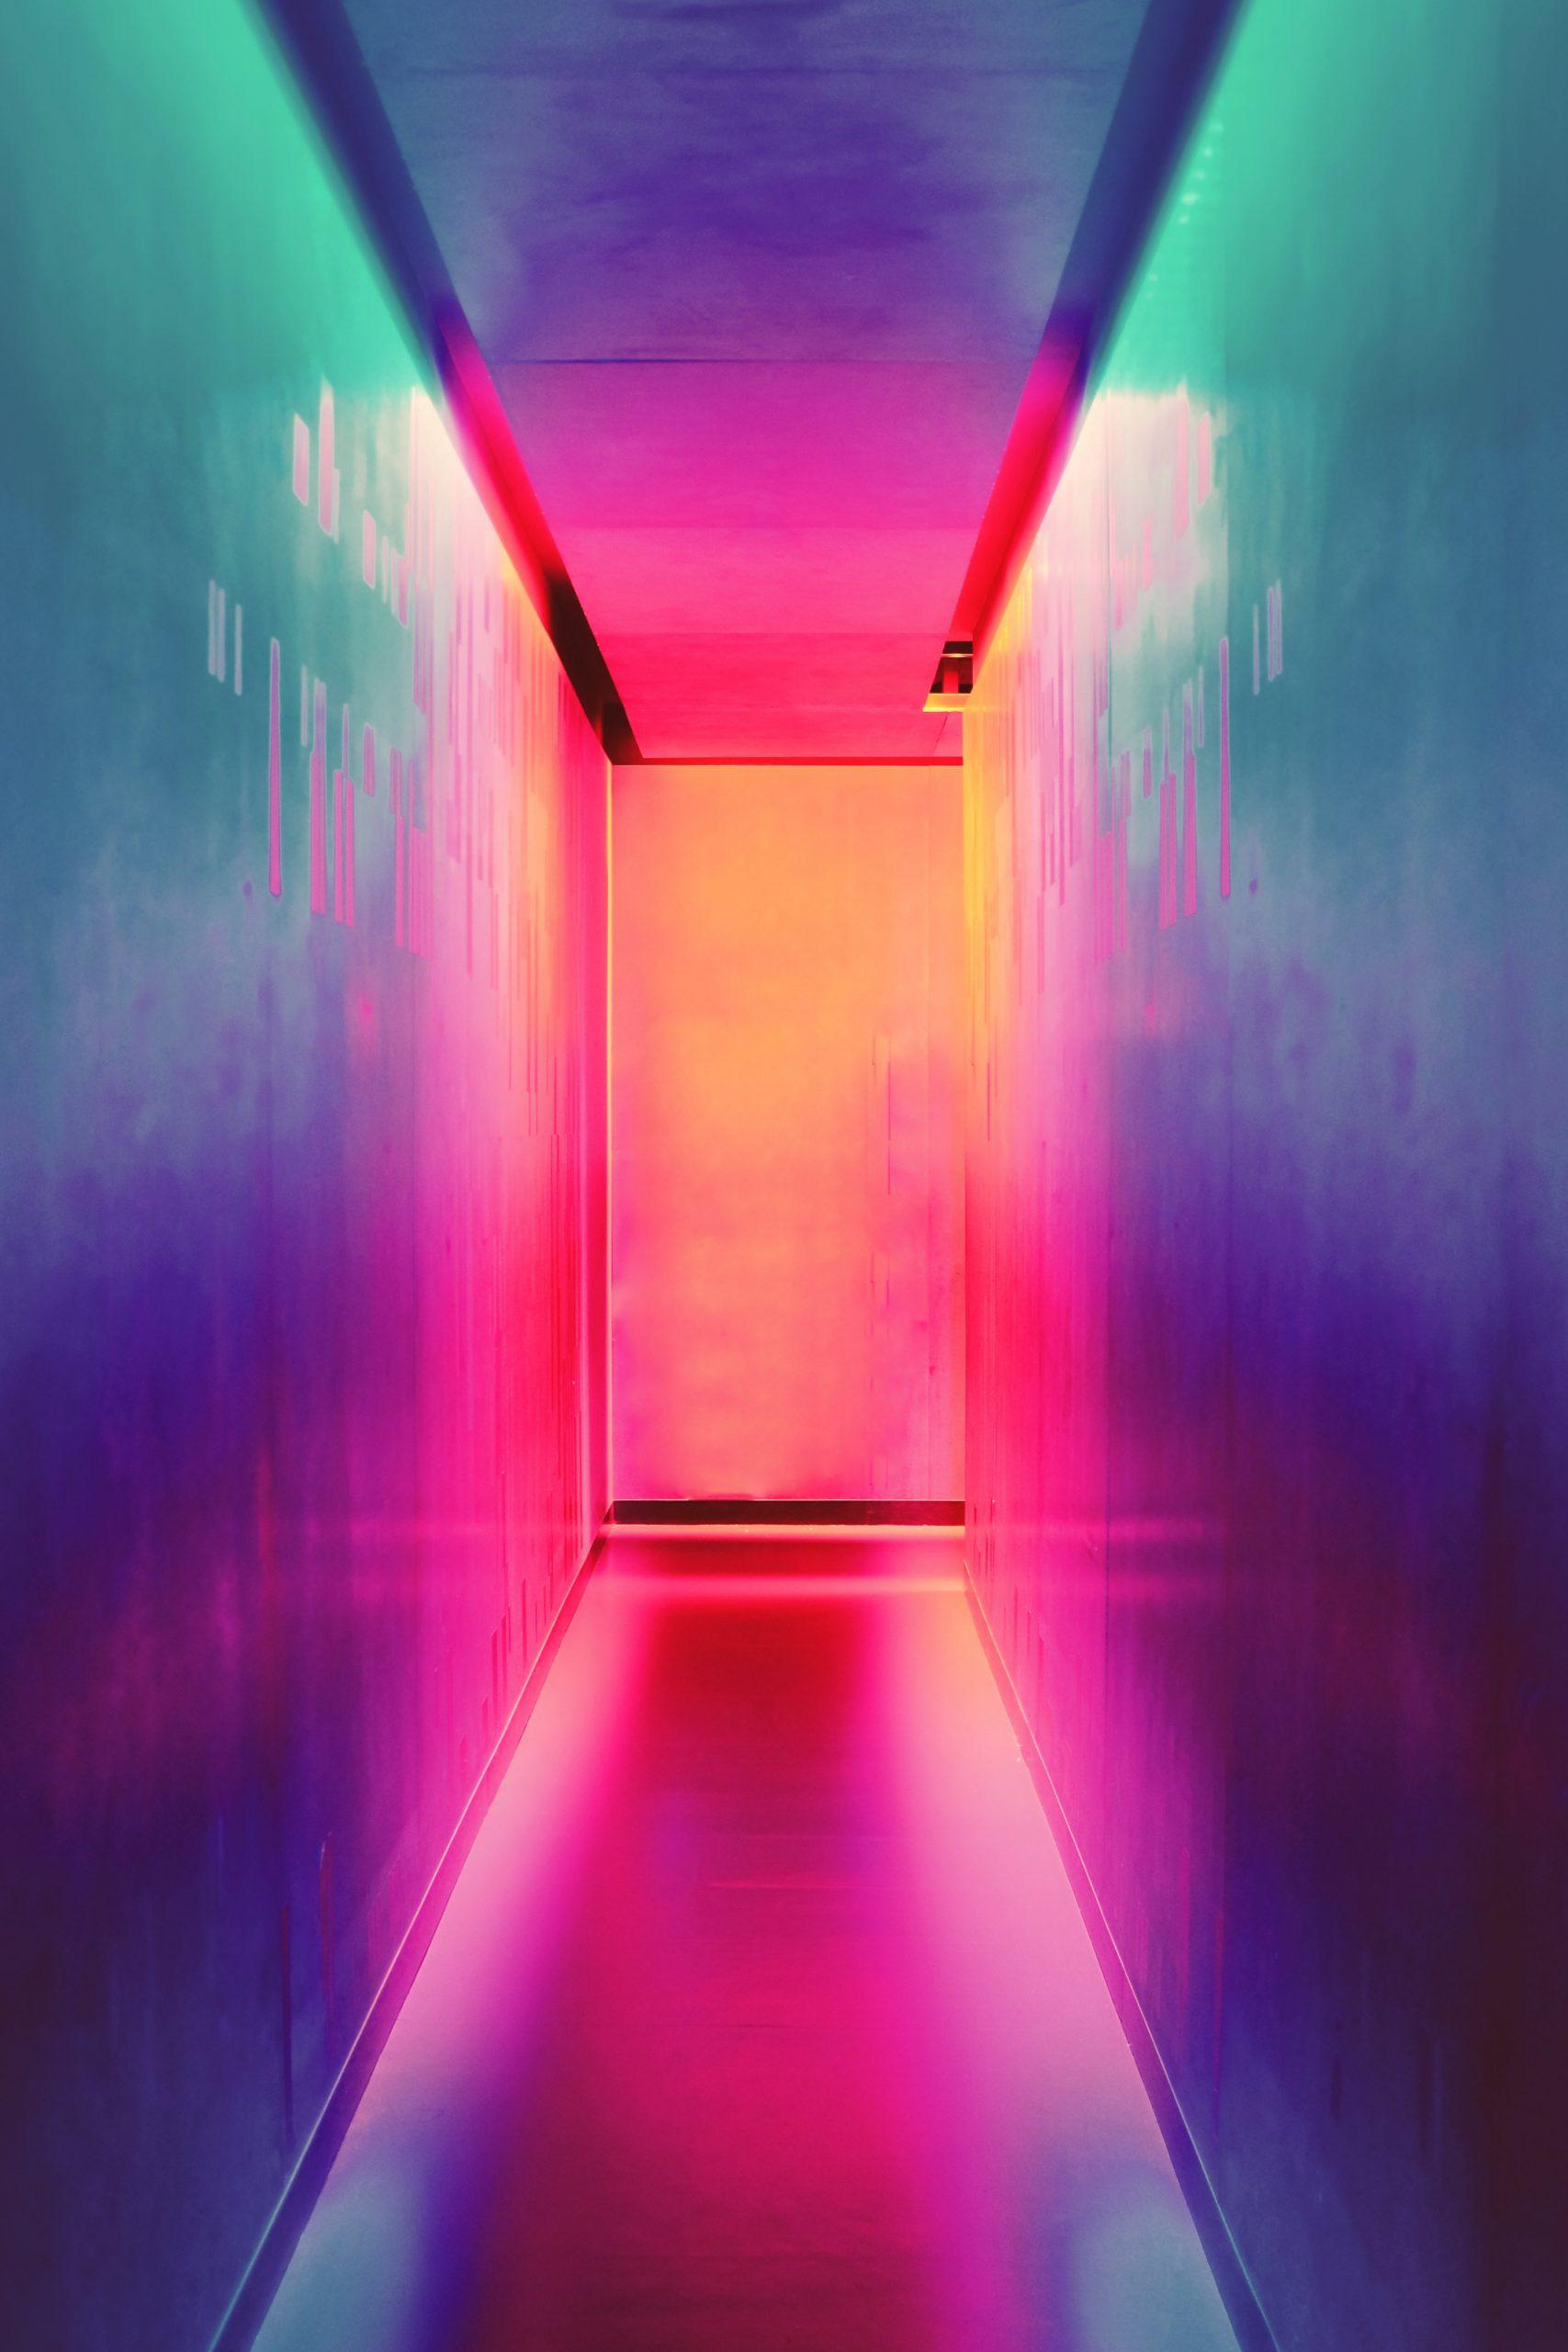 wallpaper Multicolored hallway